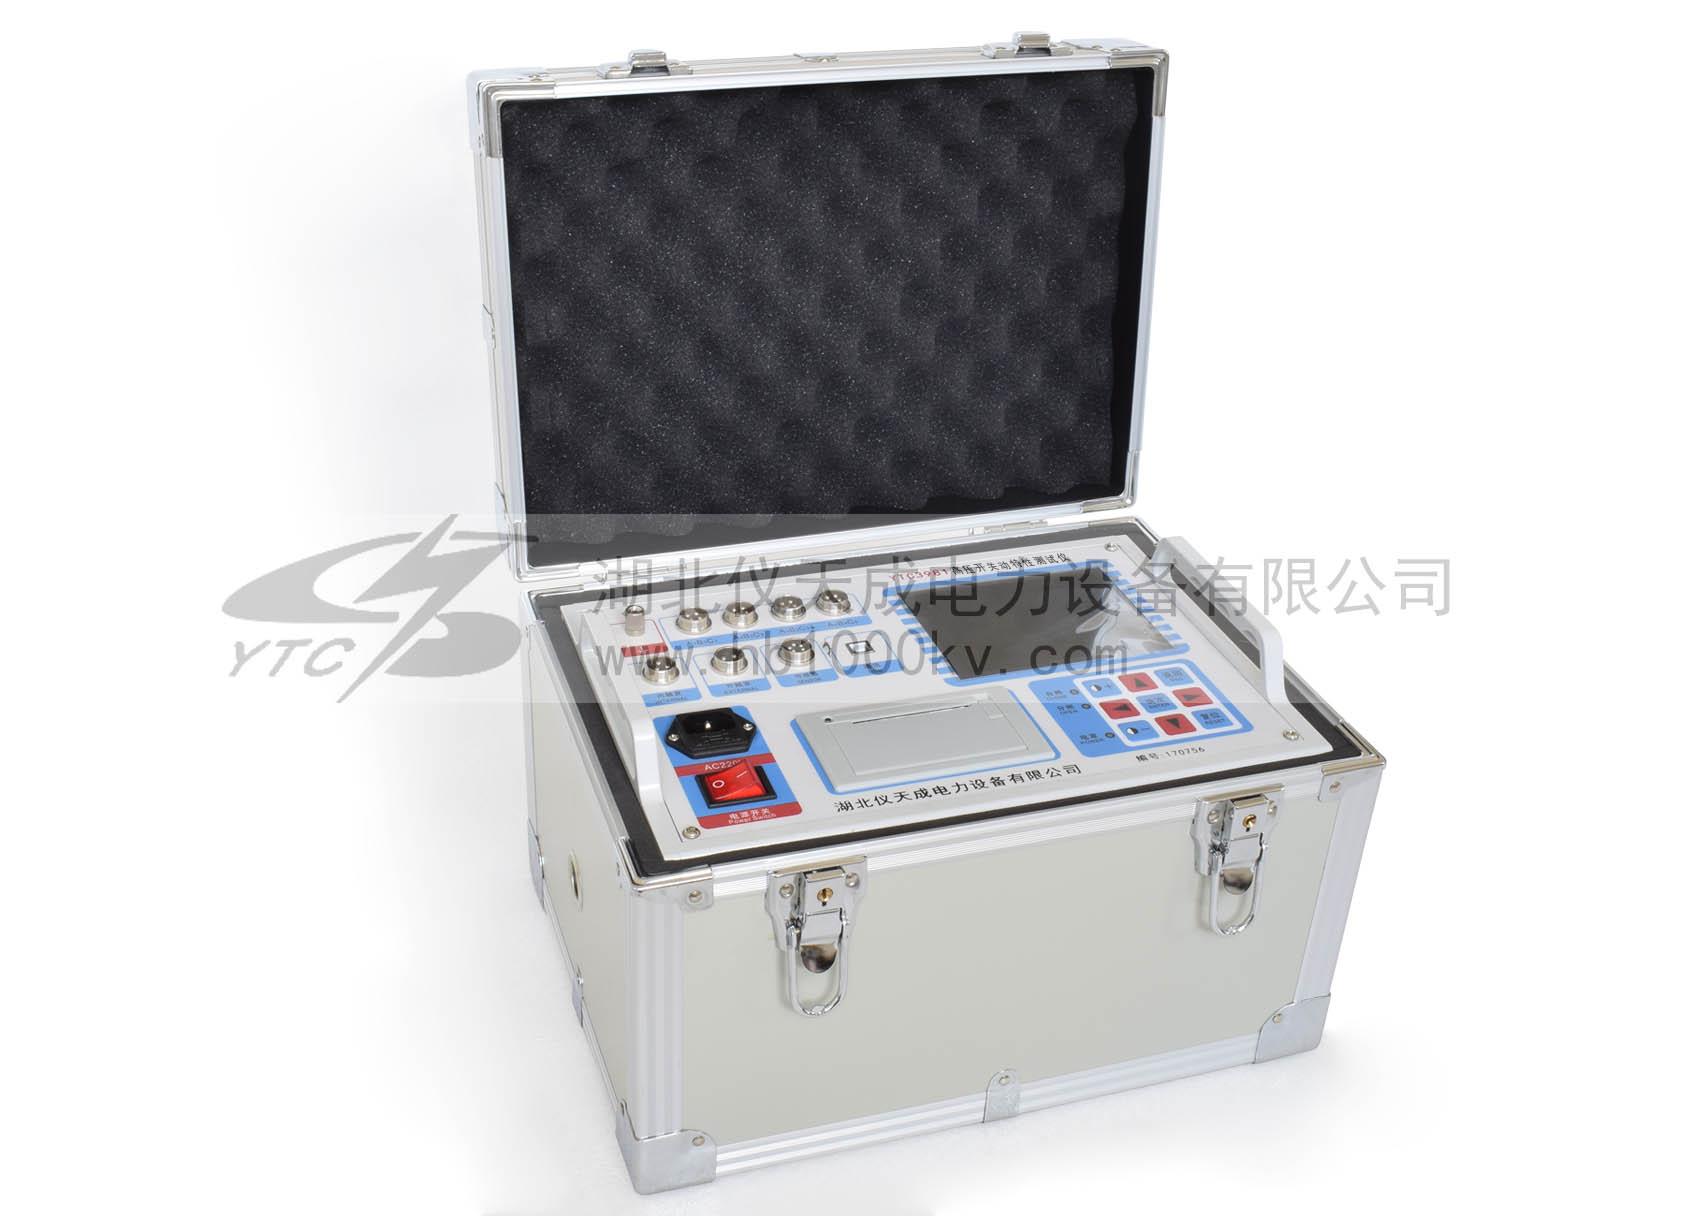 YTC3981断路器动特性测试仪主机